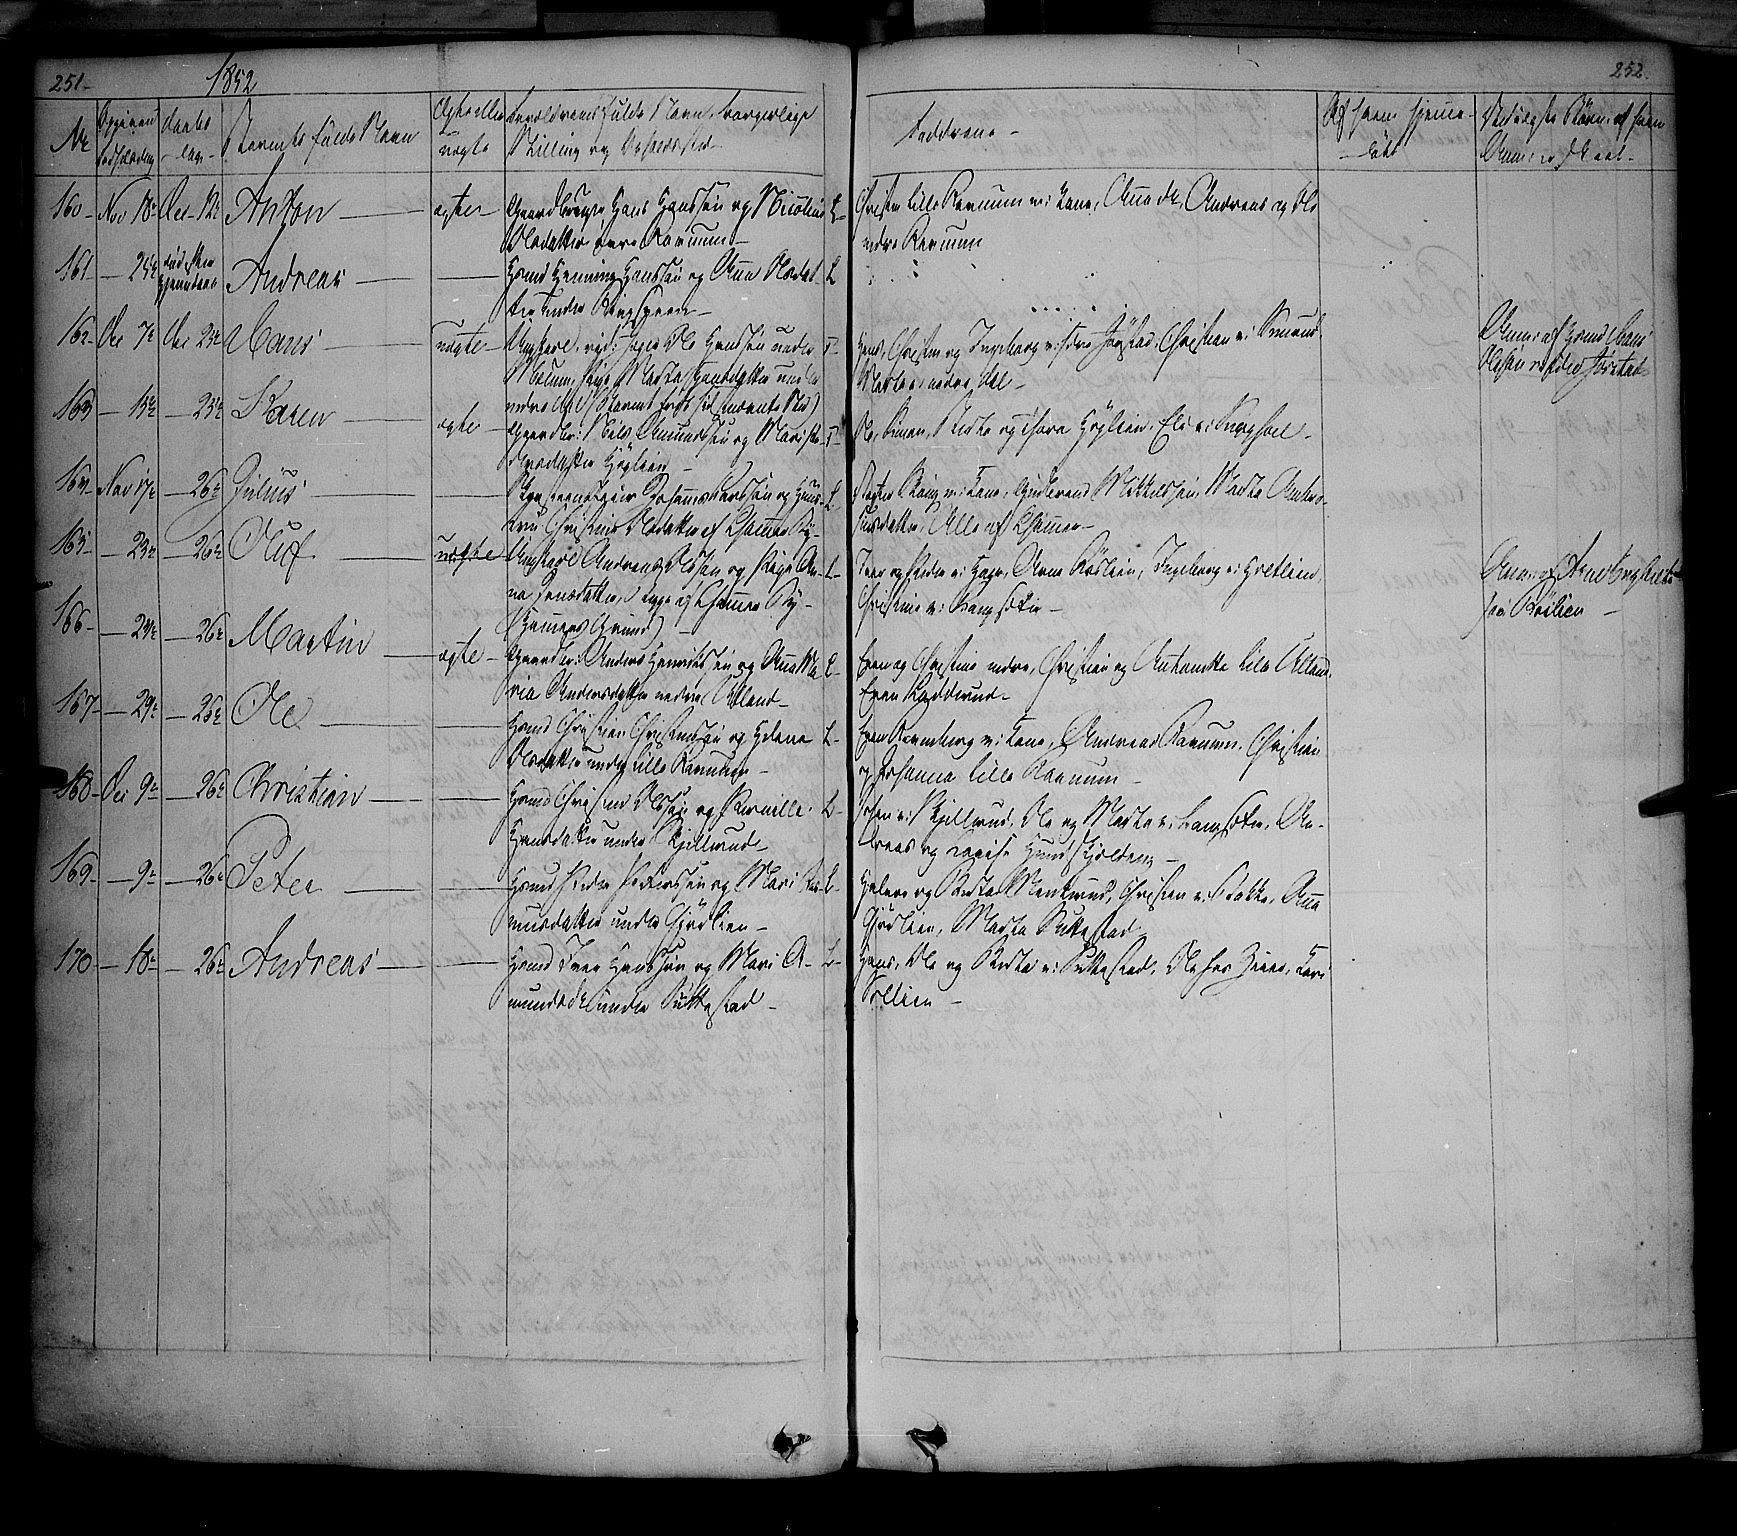 SAH, Fåberg prestekontor, Ministerialbok nr. 5, 1836-1854, s. 251-252